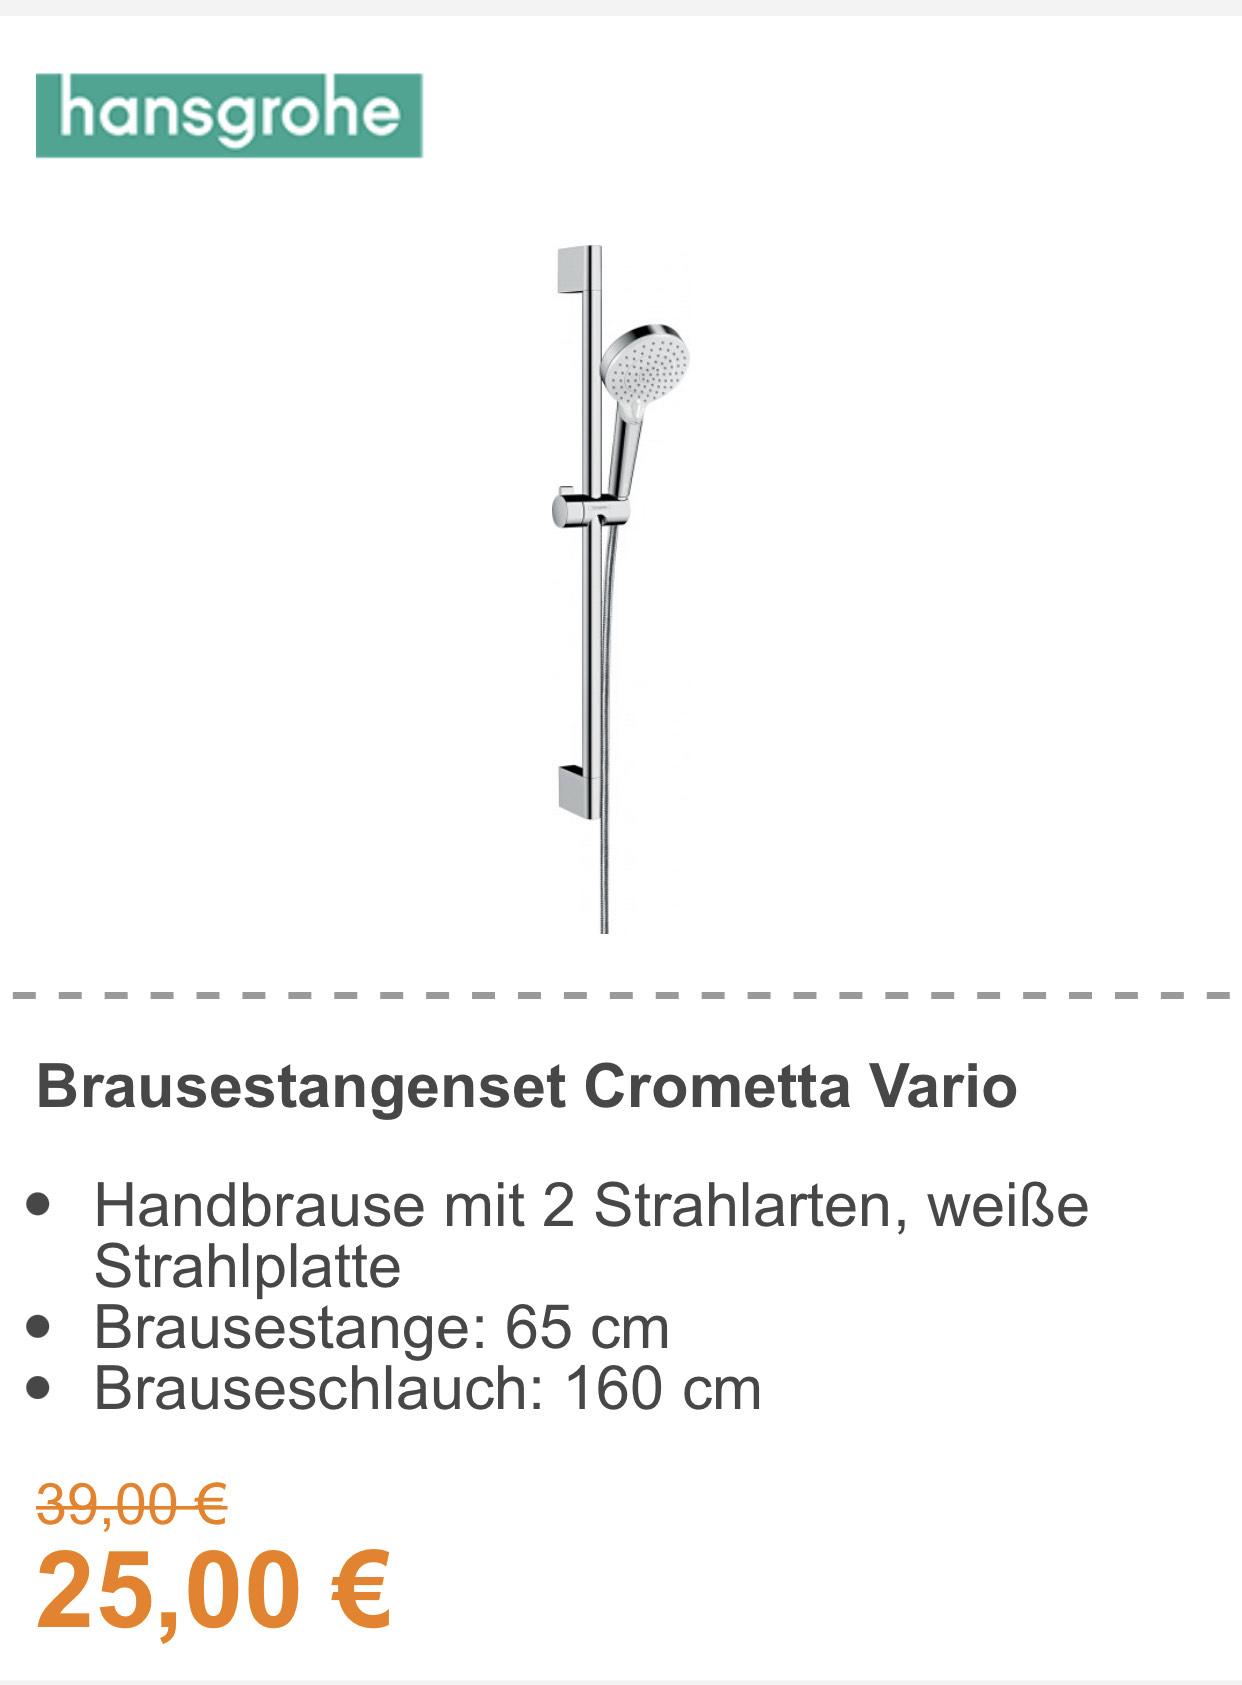 (Bauhaus TPG) Hansgrohe Brausestangenset Crometta Vario inkl. Handbrause, Brausestange, Brauseschlauch 65cm